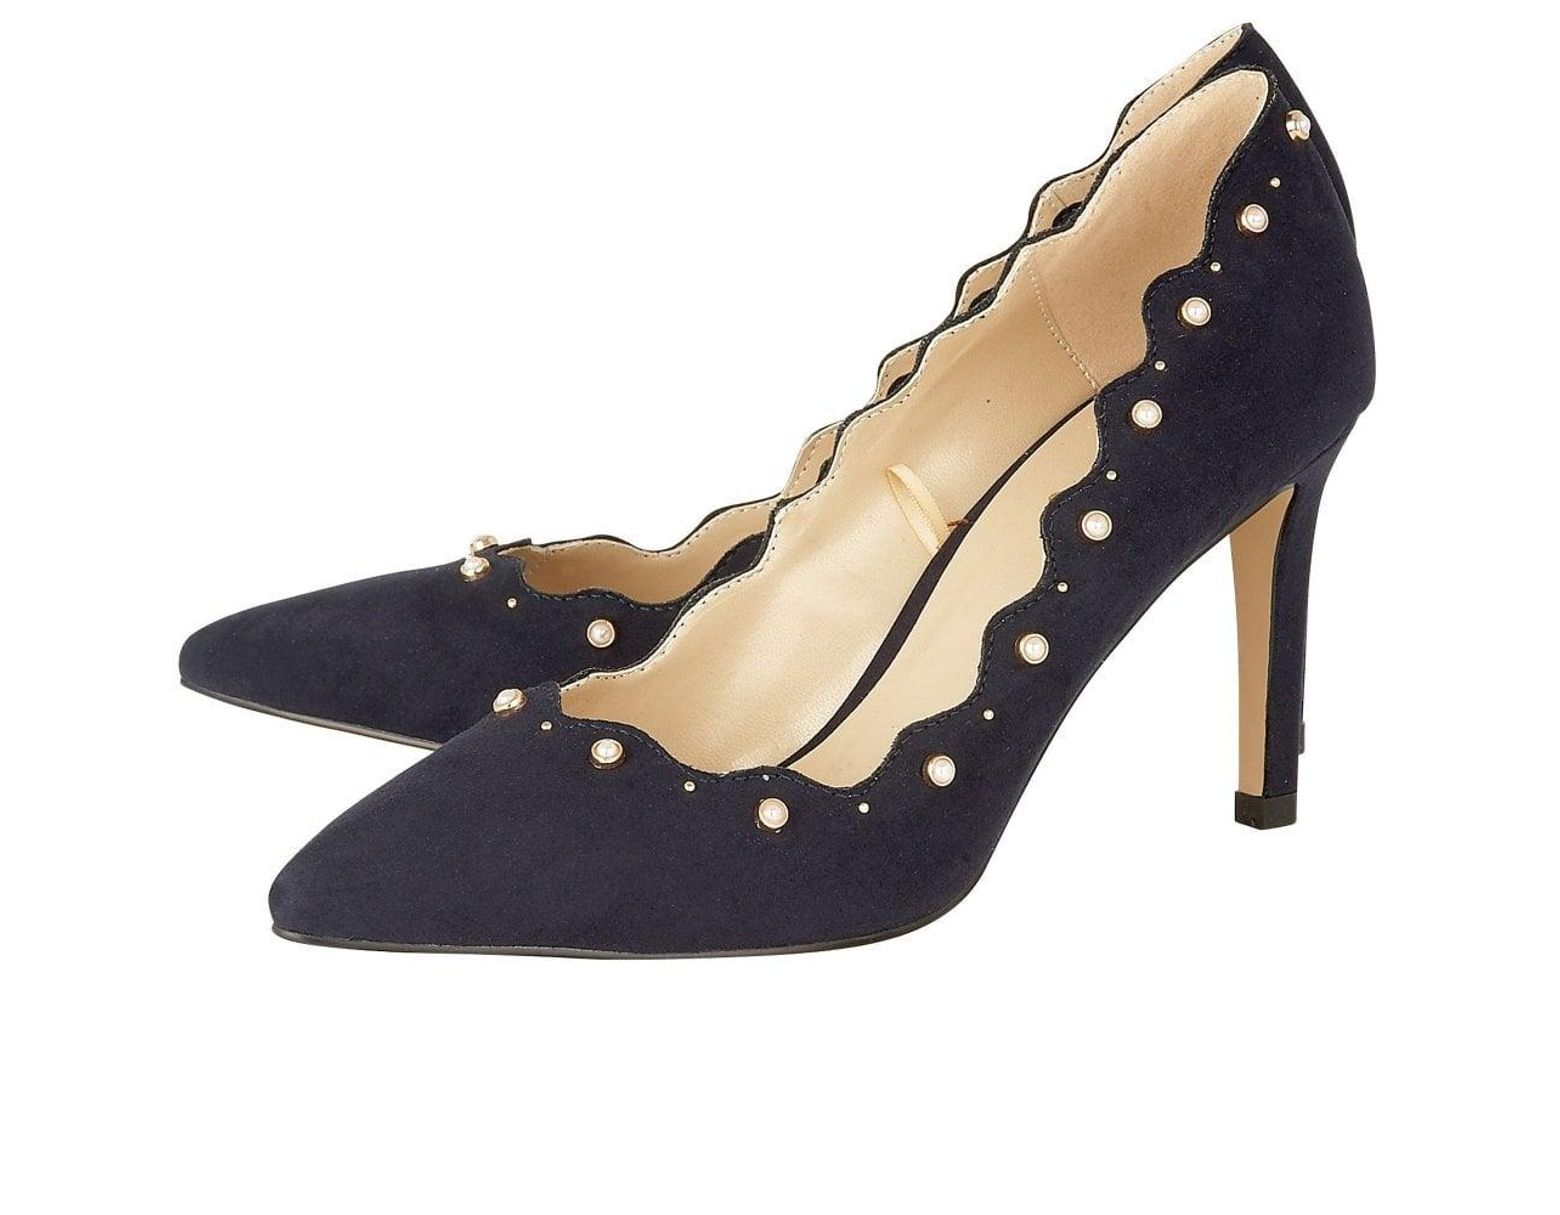 630dc15e2da7 Lotus Popple Womens Pearl Embellished Court Shoe in Blue - Lyst